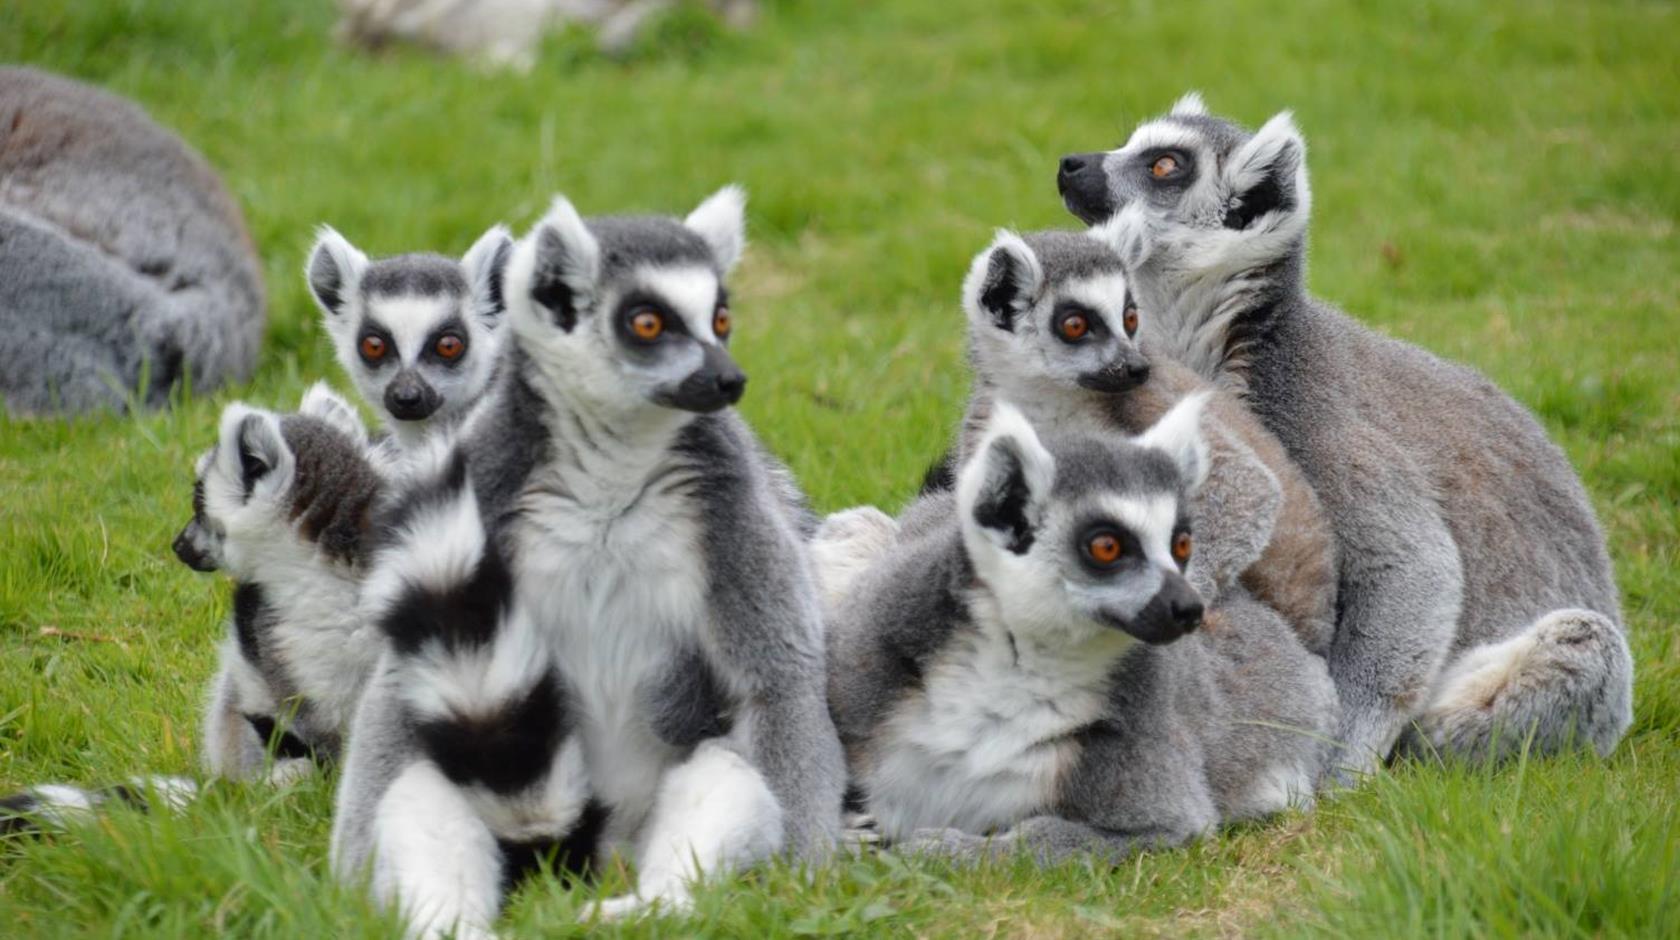 34423-wingham-wildlife-park-canterbury-08.jpg